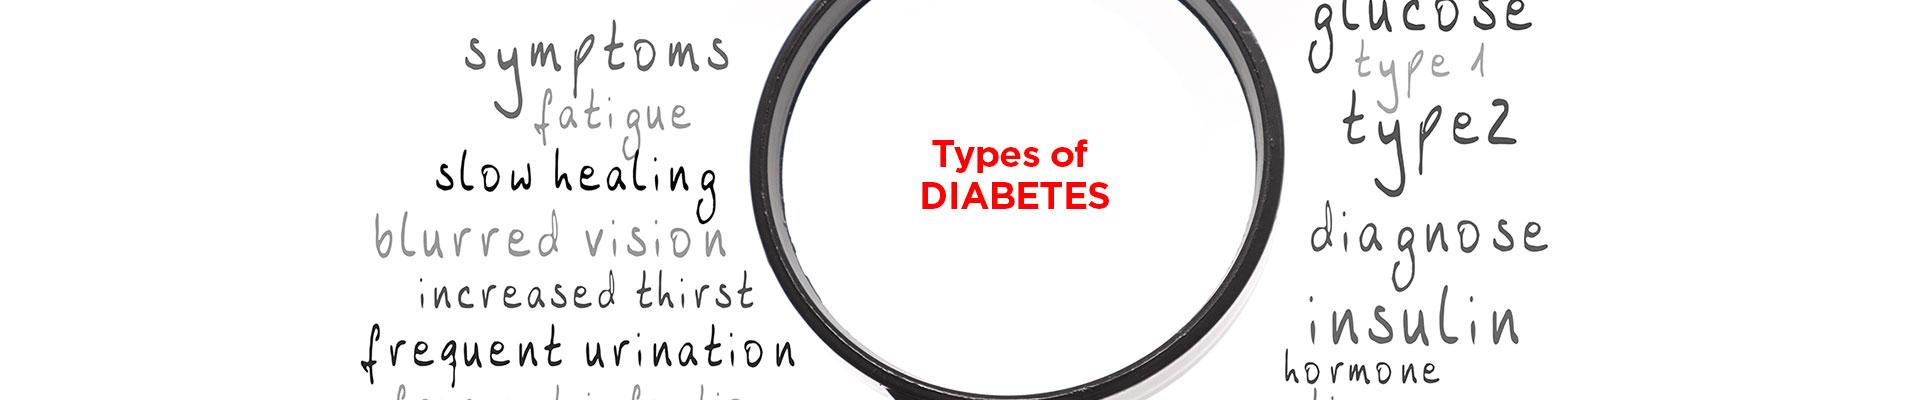 types-of-diabetes